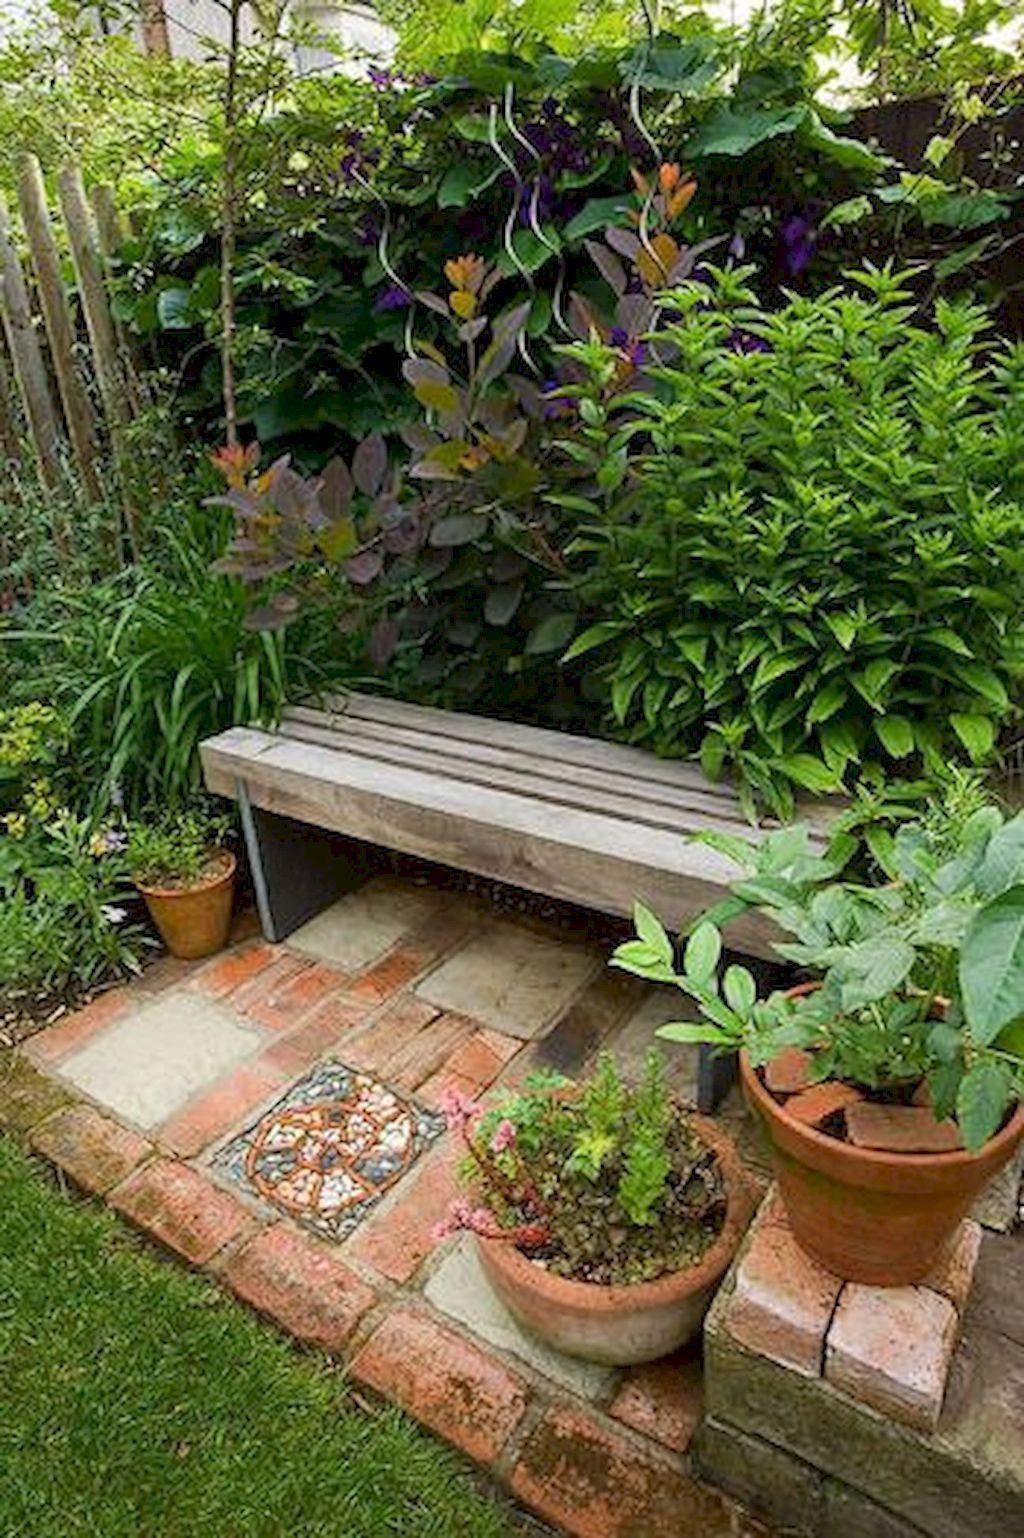 landscape design kerala style  Backyard seating area, Small